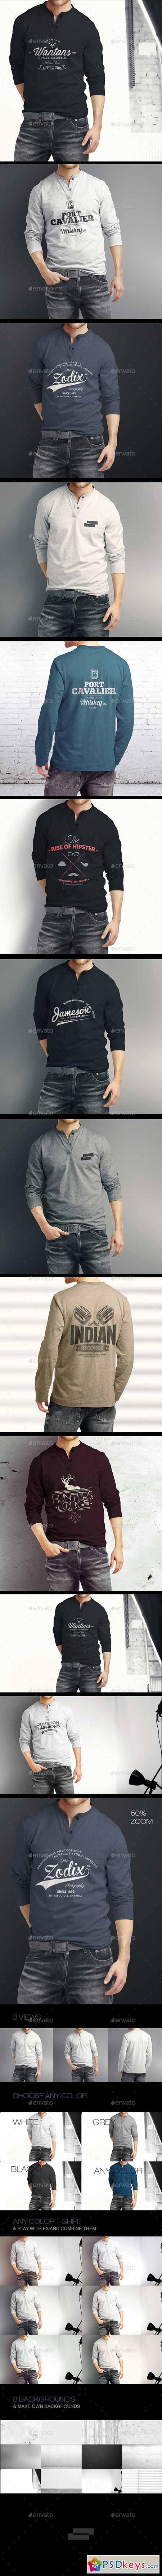 Man Longsleeve Shirt Mock-up 9610861